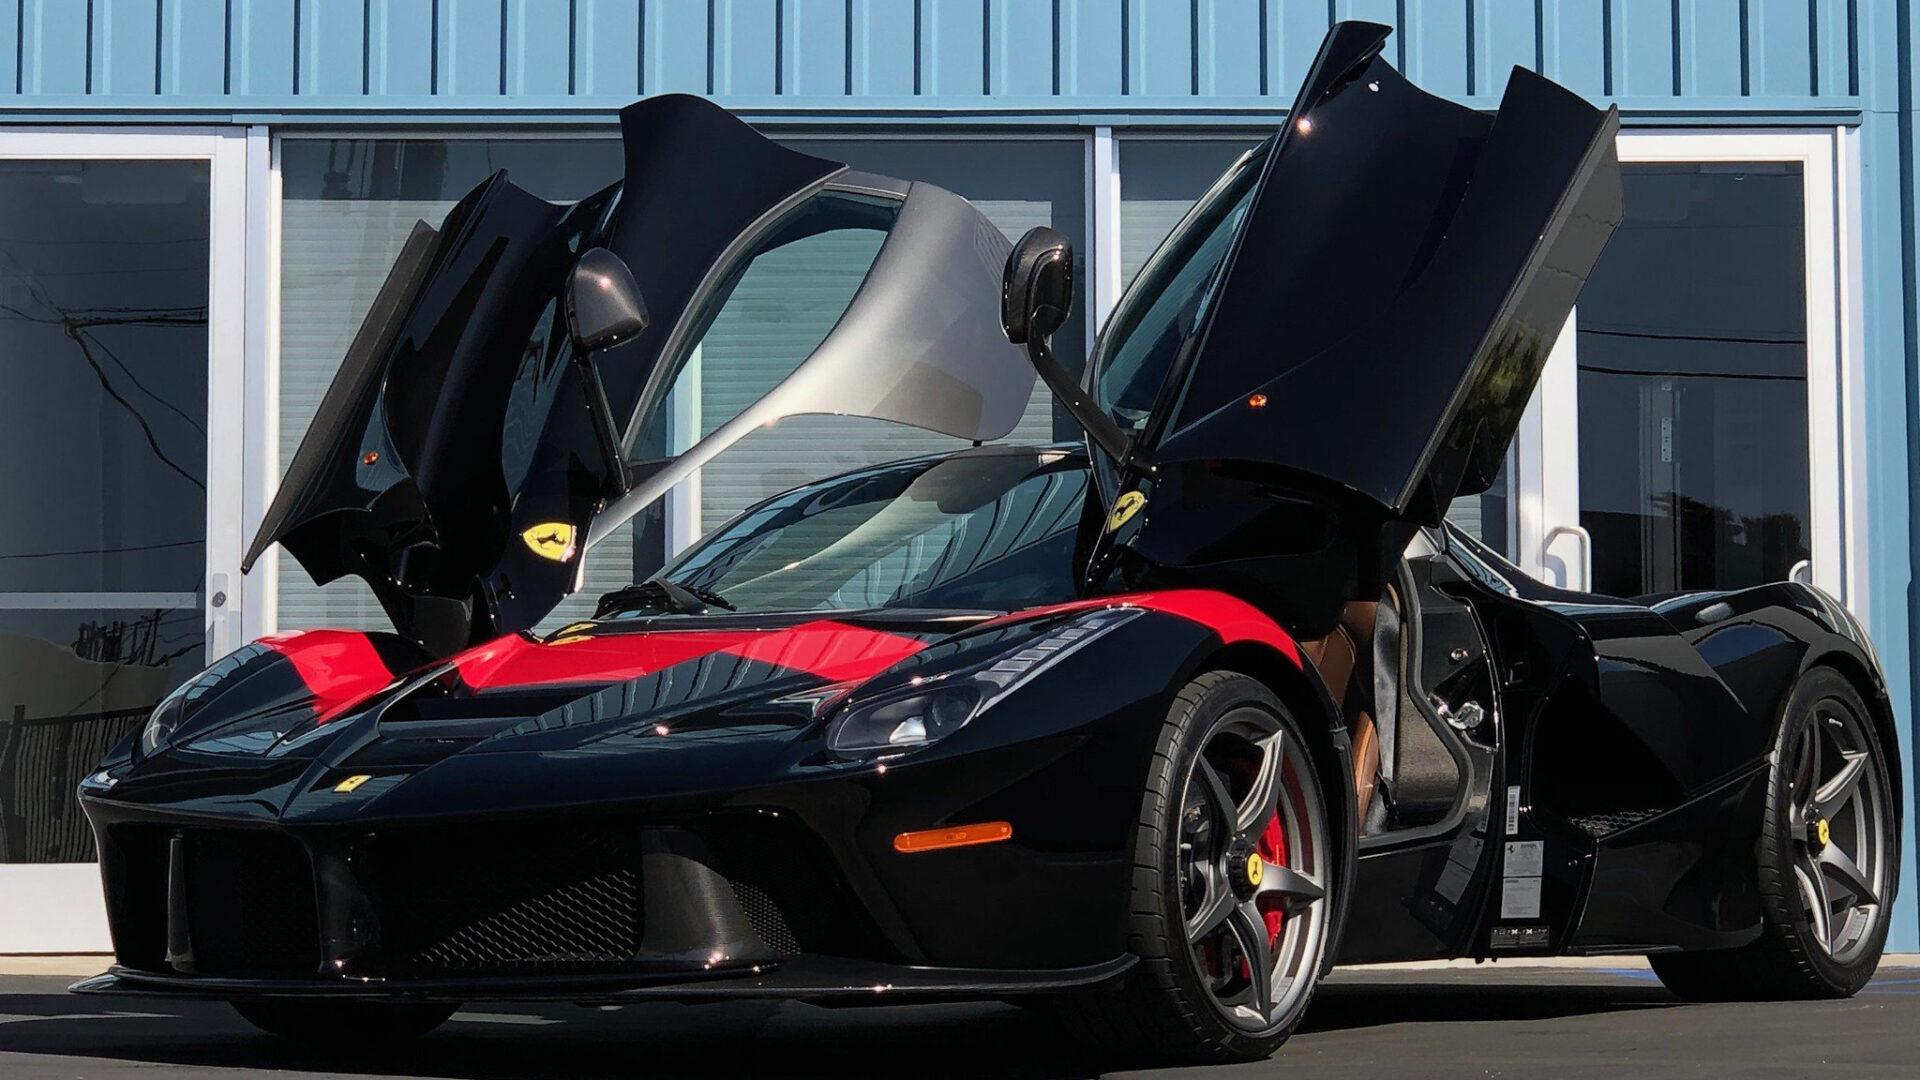 A 2014 Ferrari Laferrari Dealership